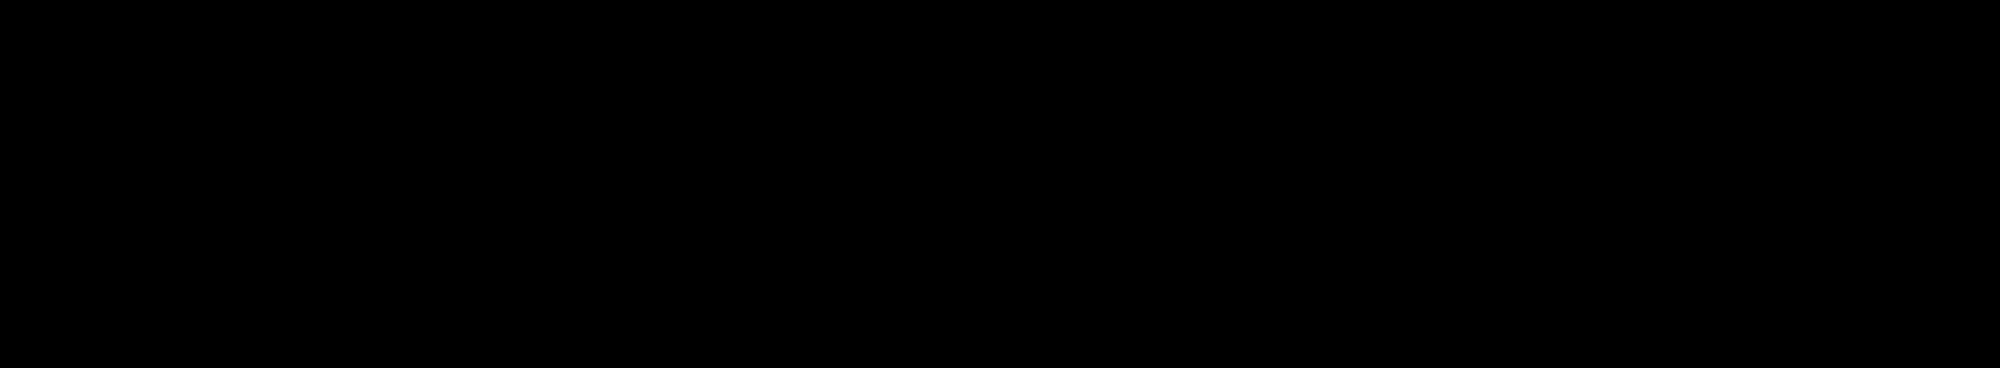 Logo Behance PNG - 114108